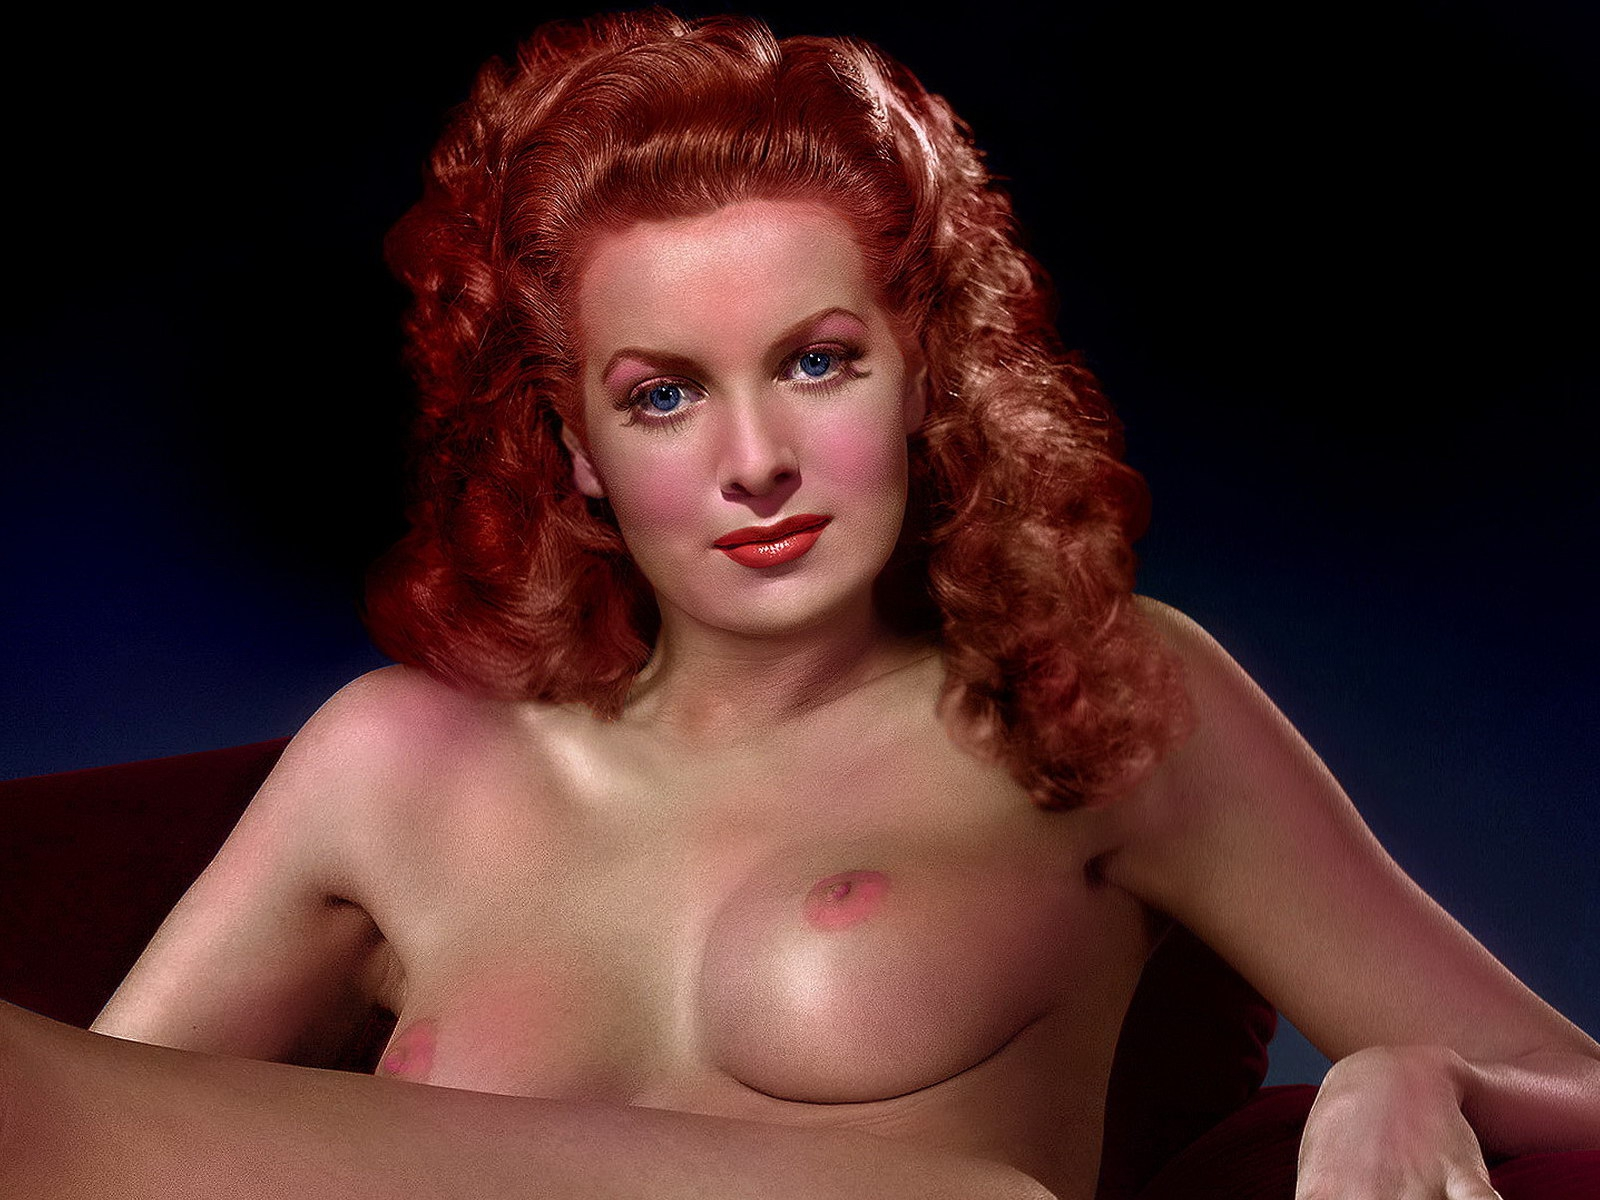 Maureen Ohara Nude - Hot Girls Wallpaper